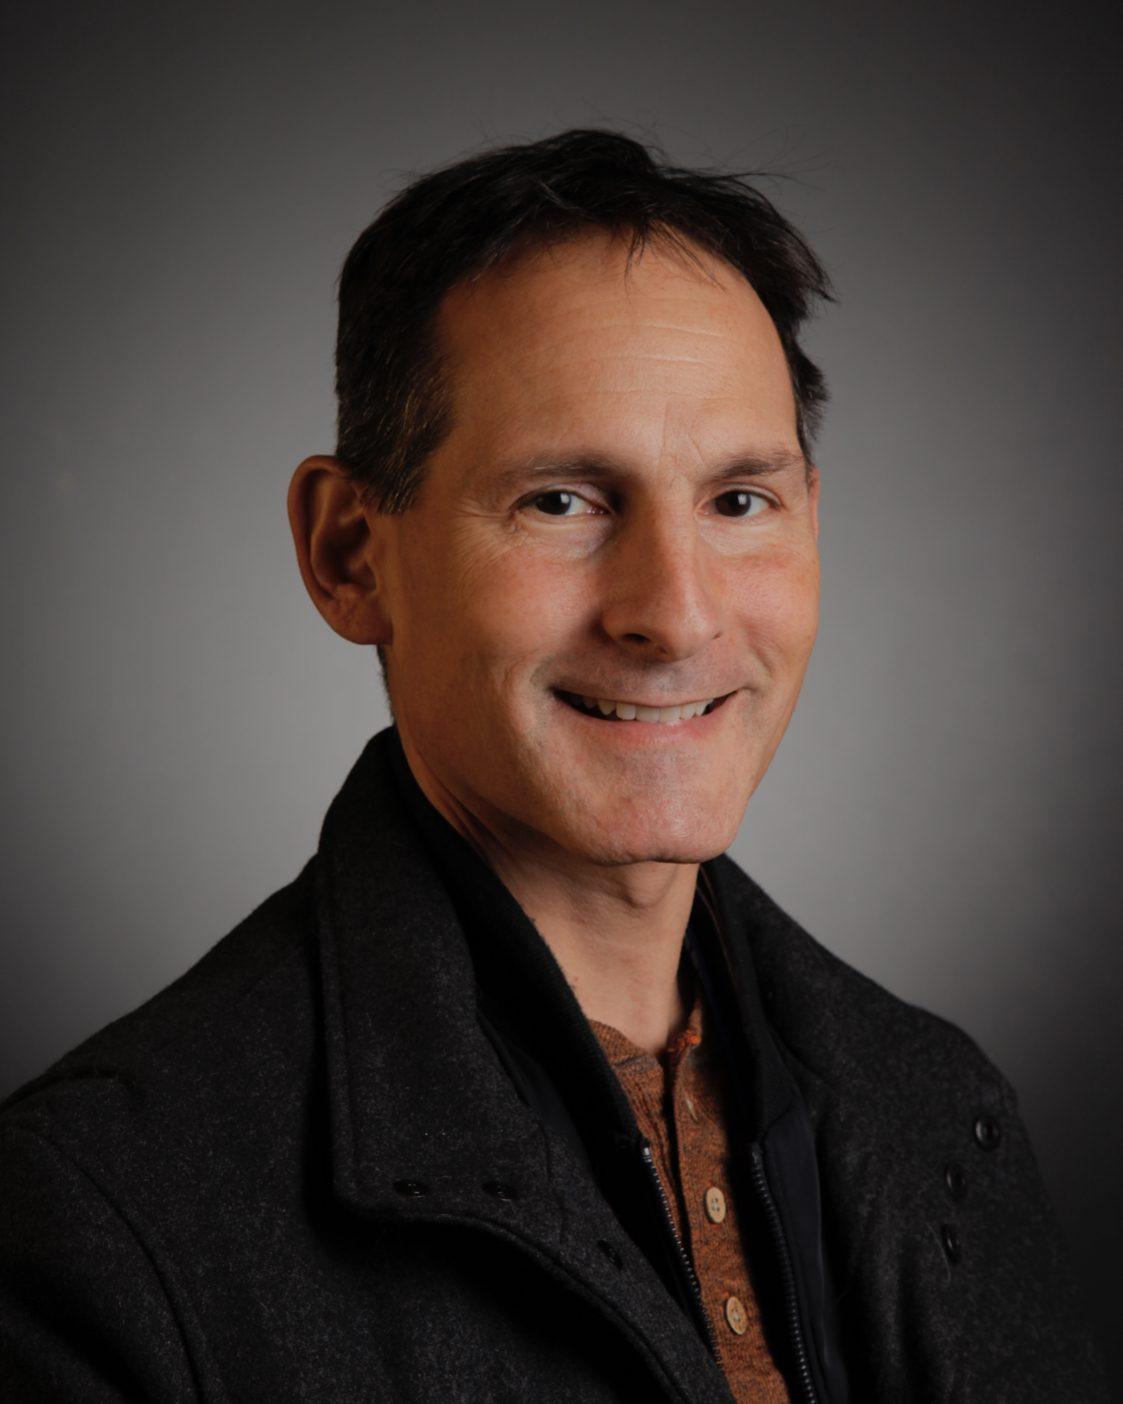 Picture of Dr. Sebastian Mahfood